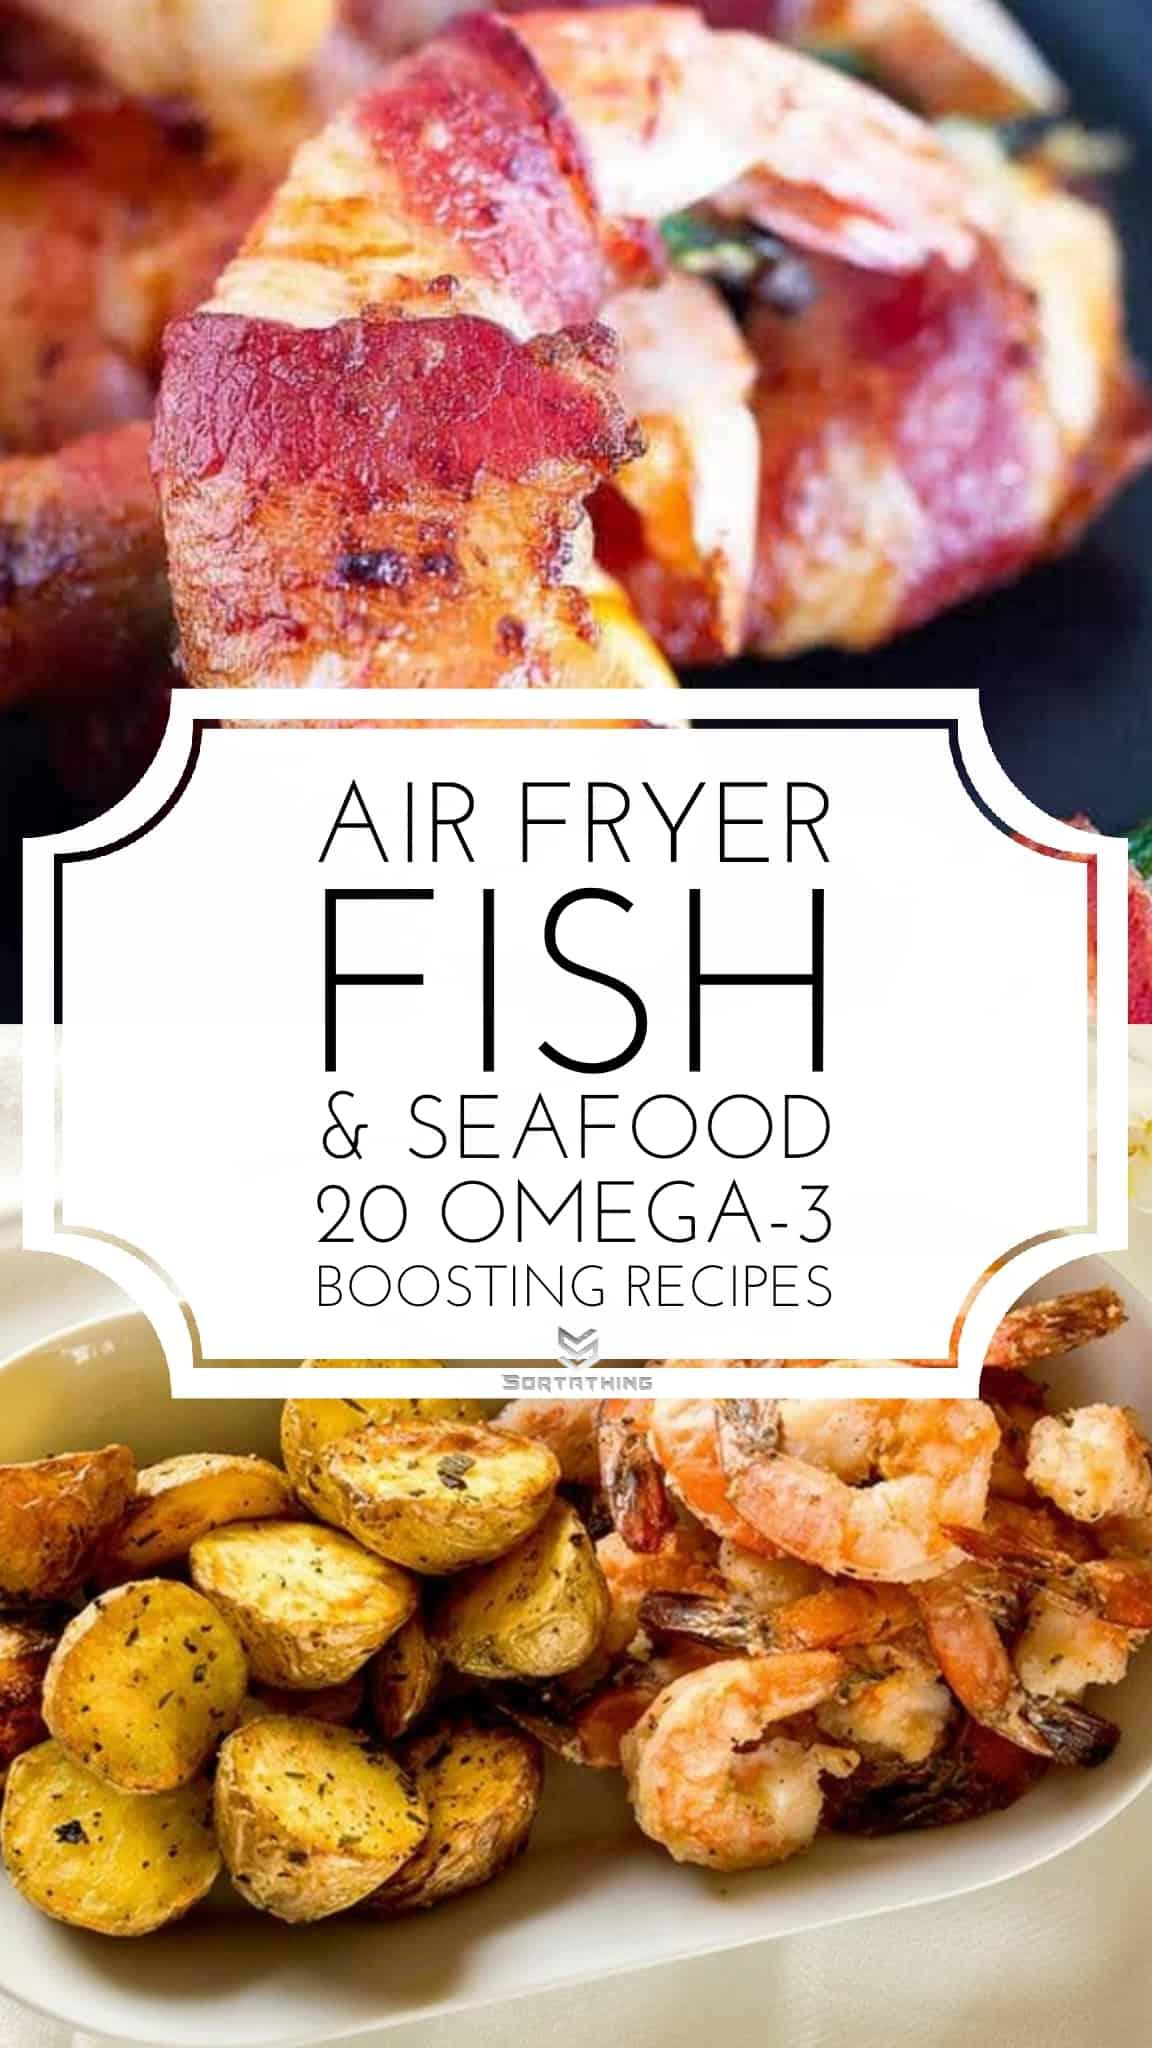 Air Fryer Bacon Wrapped Shrimp & Air Fryer Salt & Pepper Shrimp